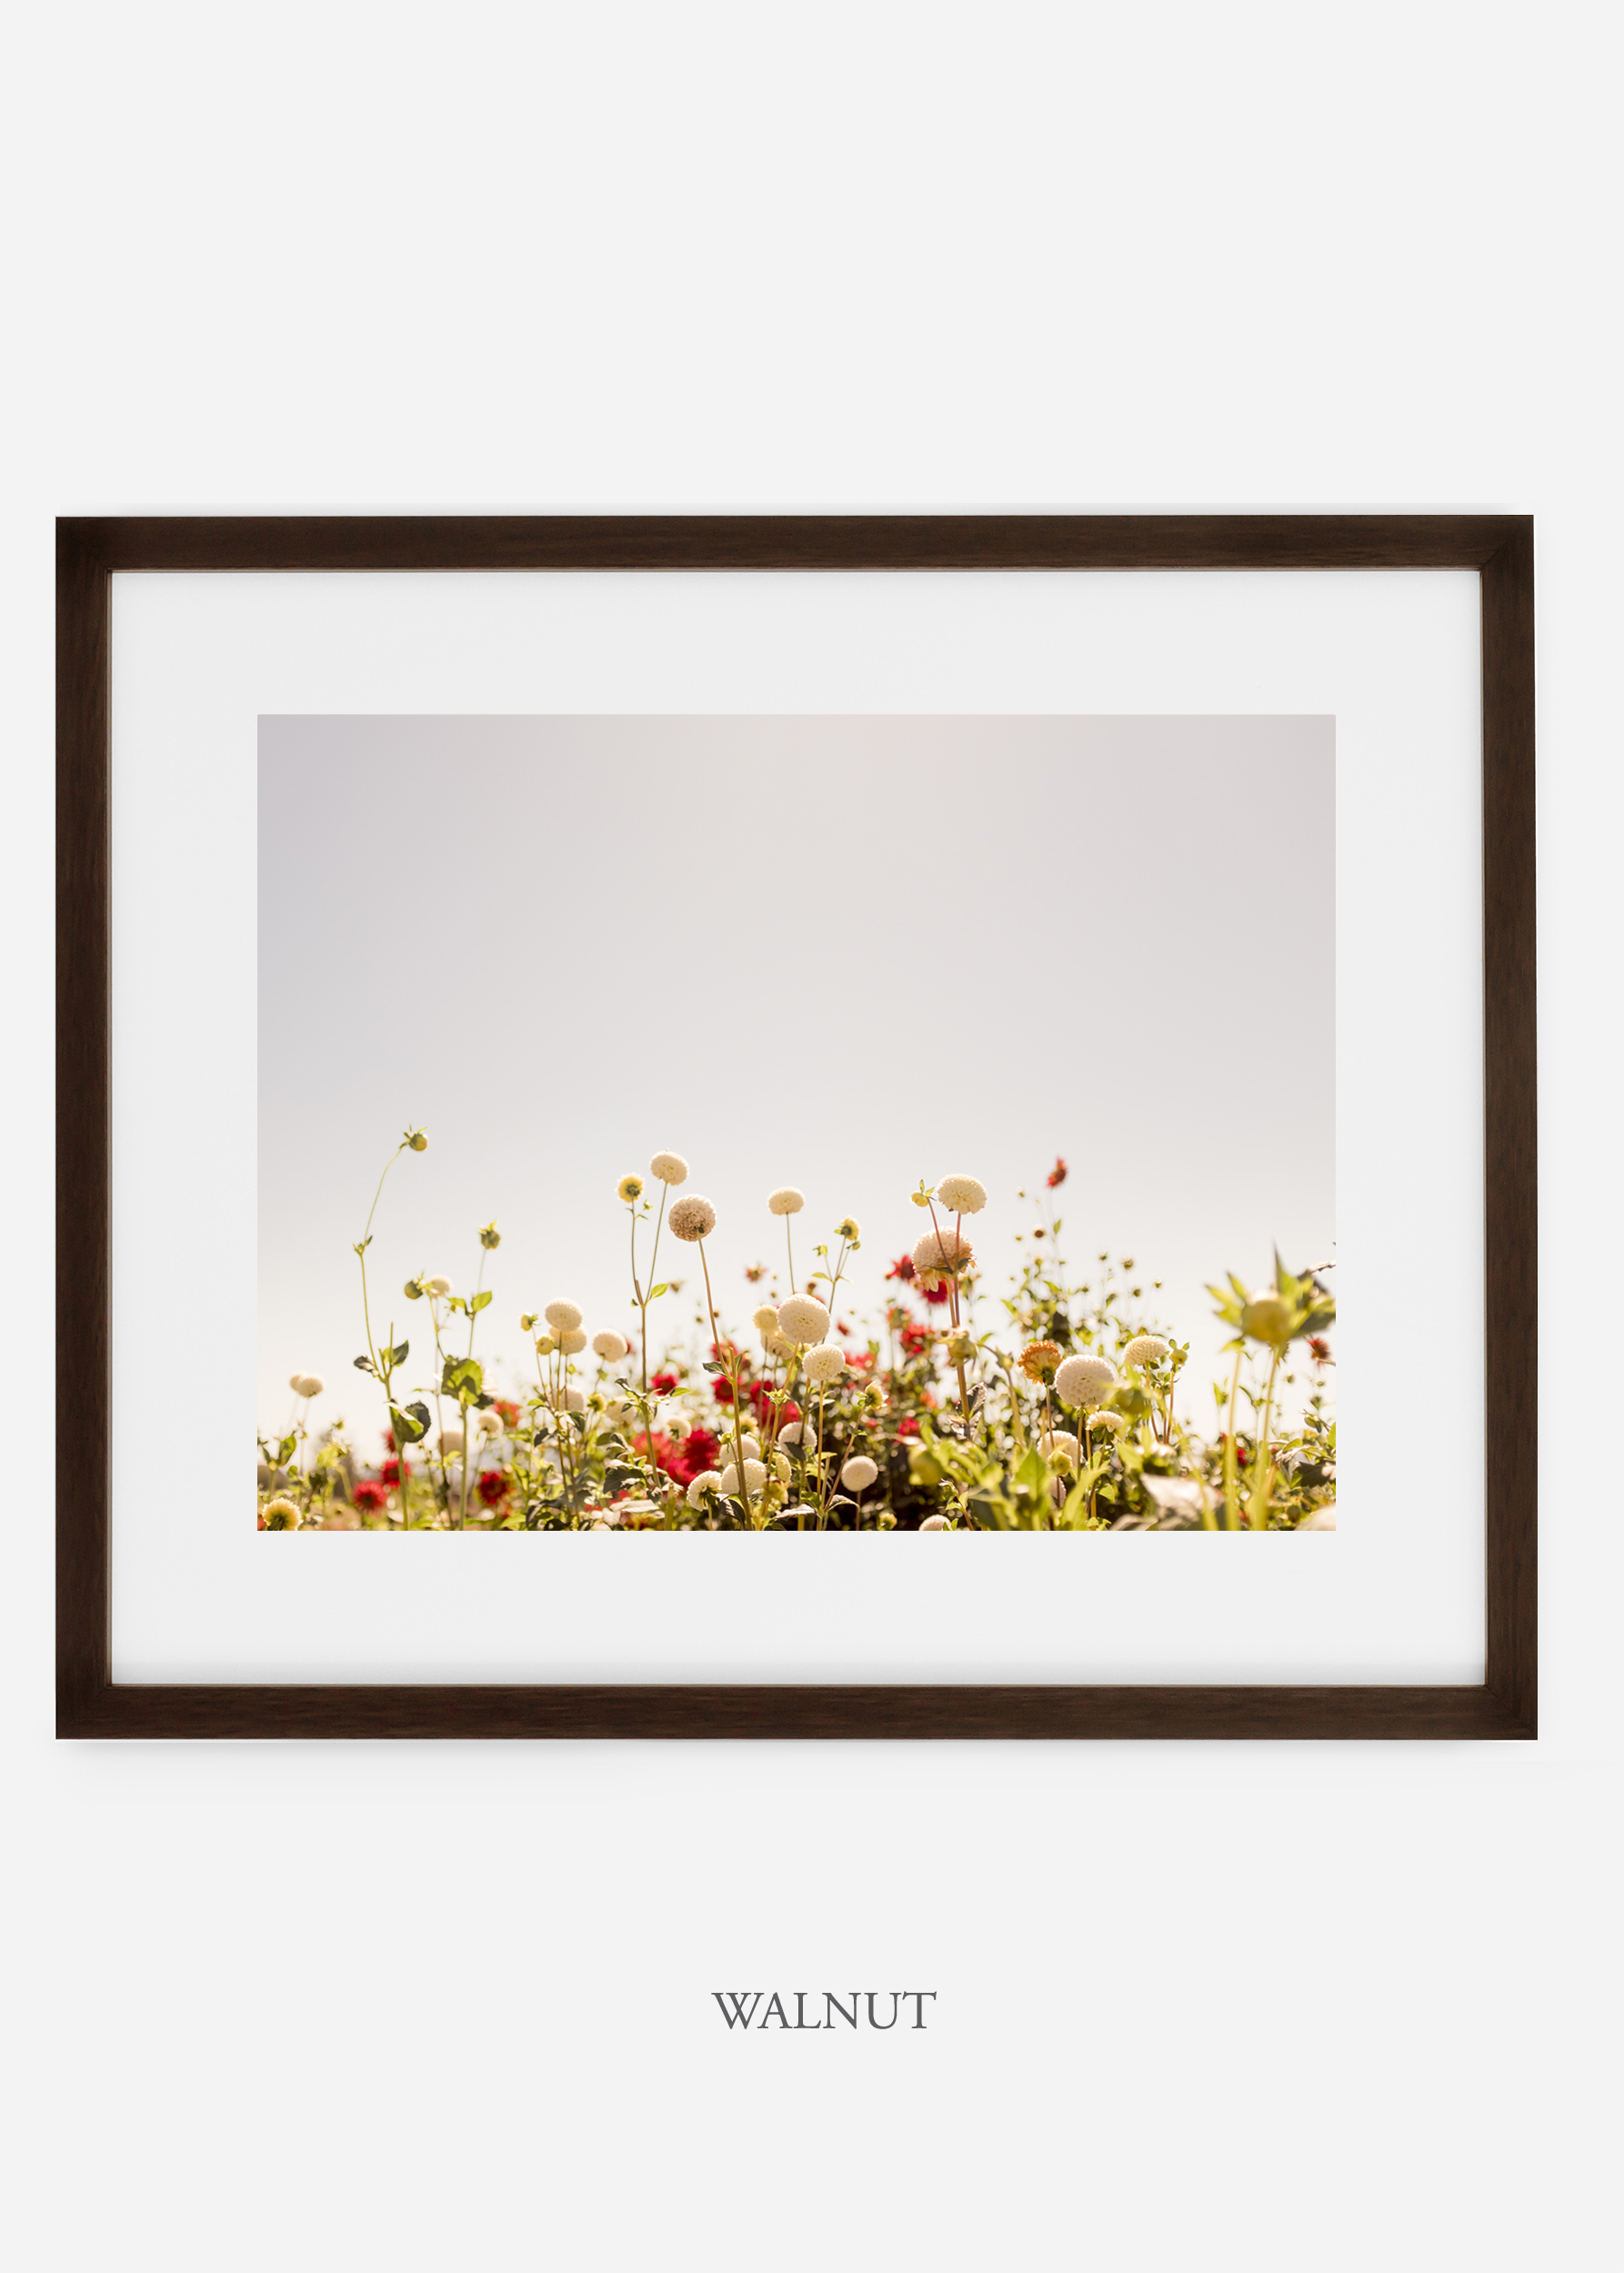 wilder-california-walnutframe-dahlia-5-minimal-botanical-print-art-interior-design.jpg